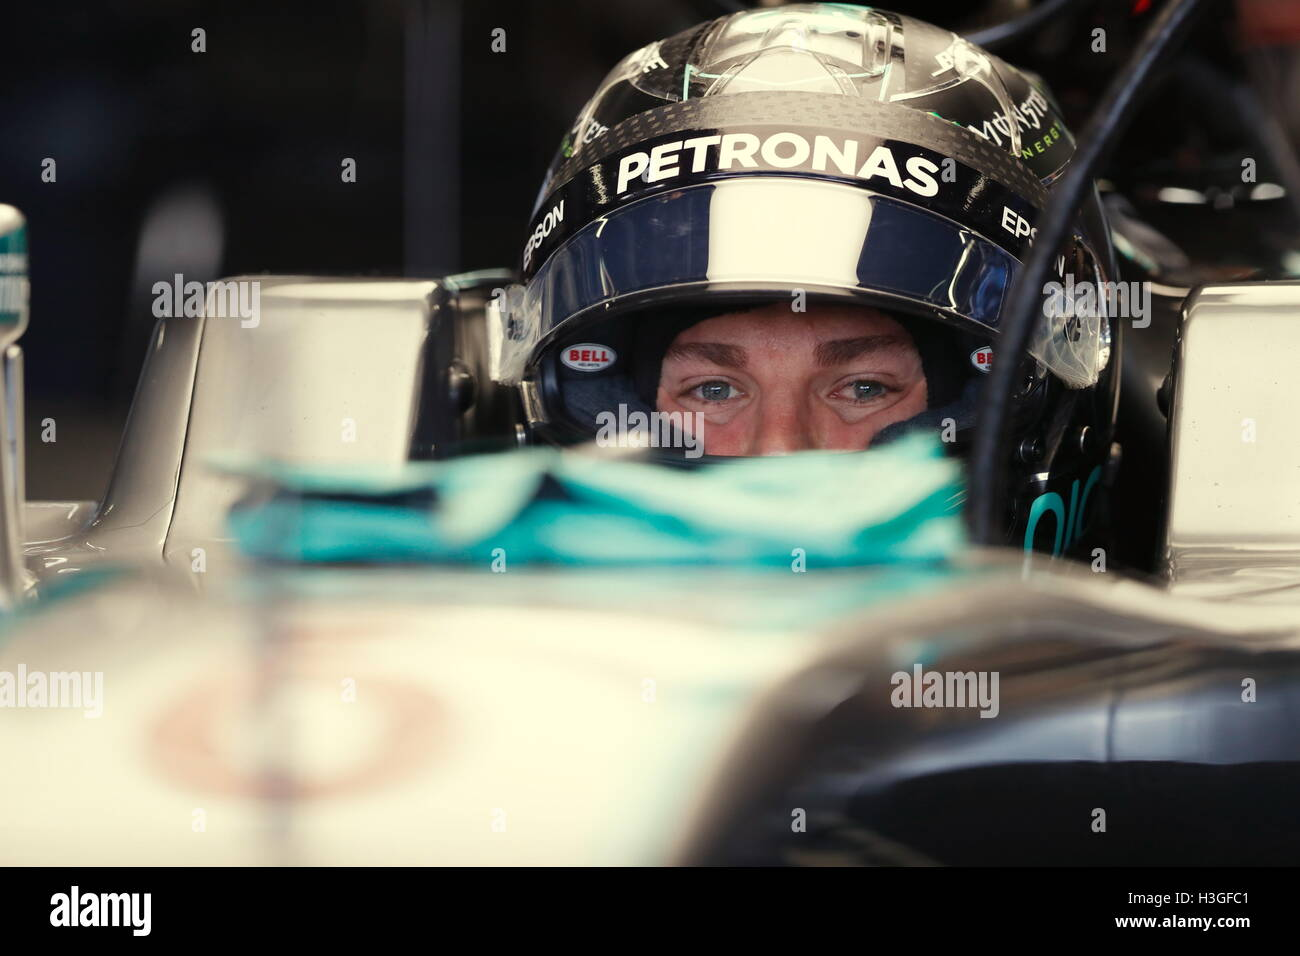 Suzuka, in Giappone. 8 Ott, 2016. Nico Rosberg (GER) F1 : Giapponese di FORMULA ONE Grand Prix sul circuito di Suzuka a Suzuka, in Giappone . Credito: Sho Tamura AFLO/sport/Alamy Live News Foto Stock